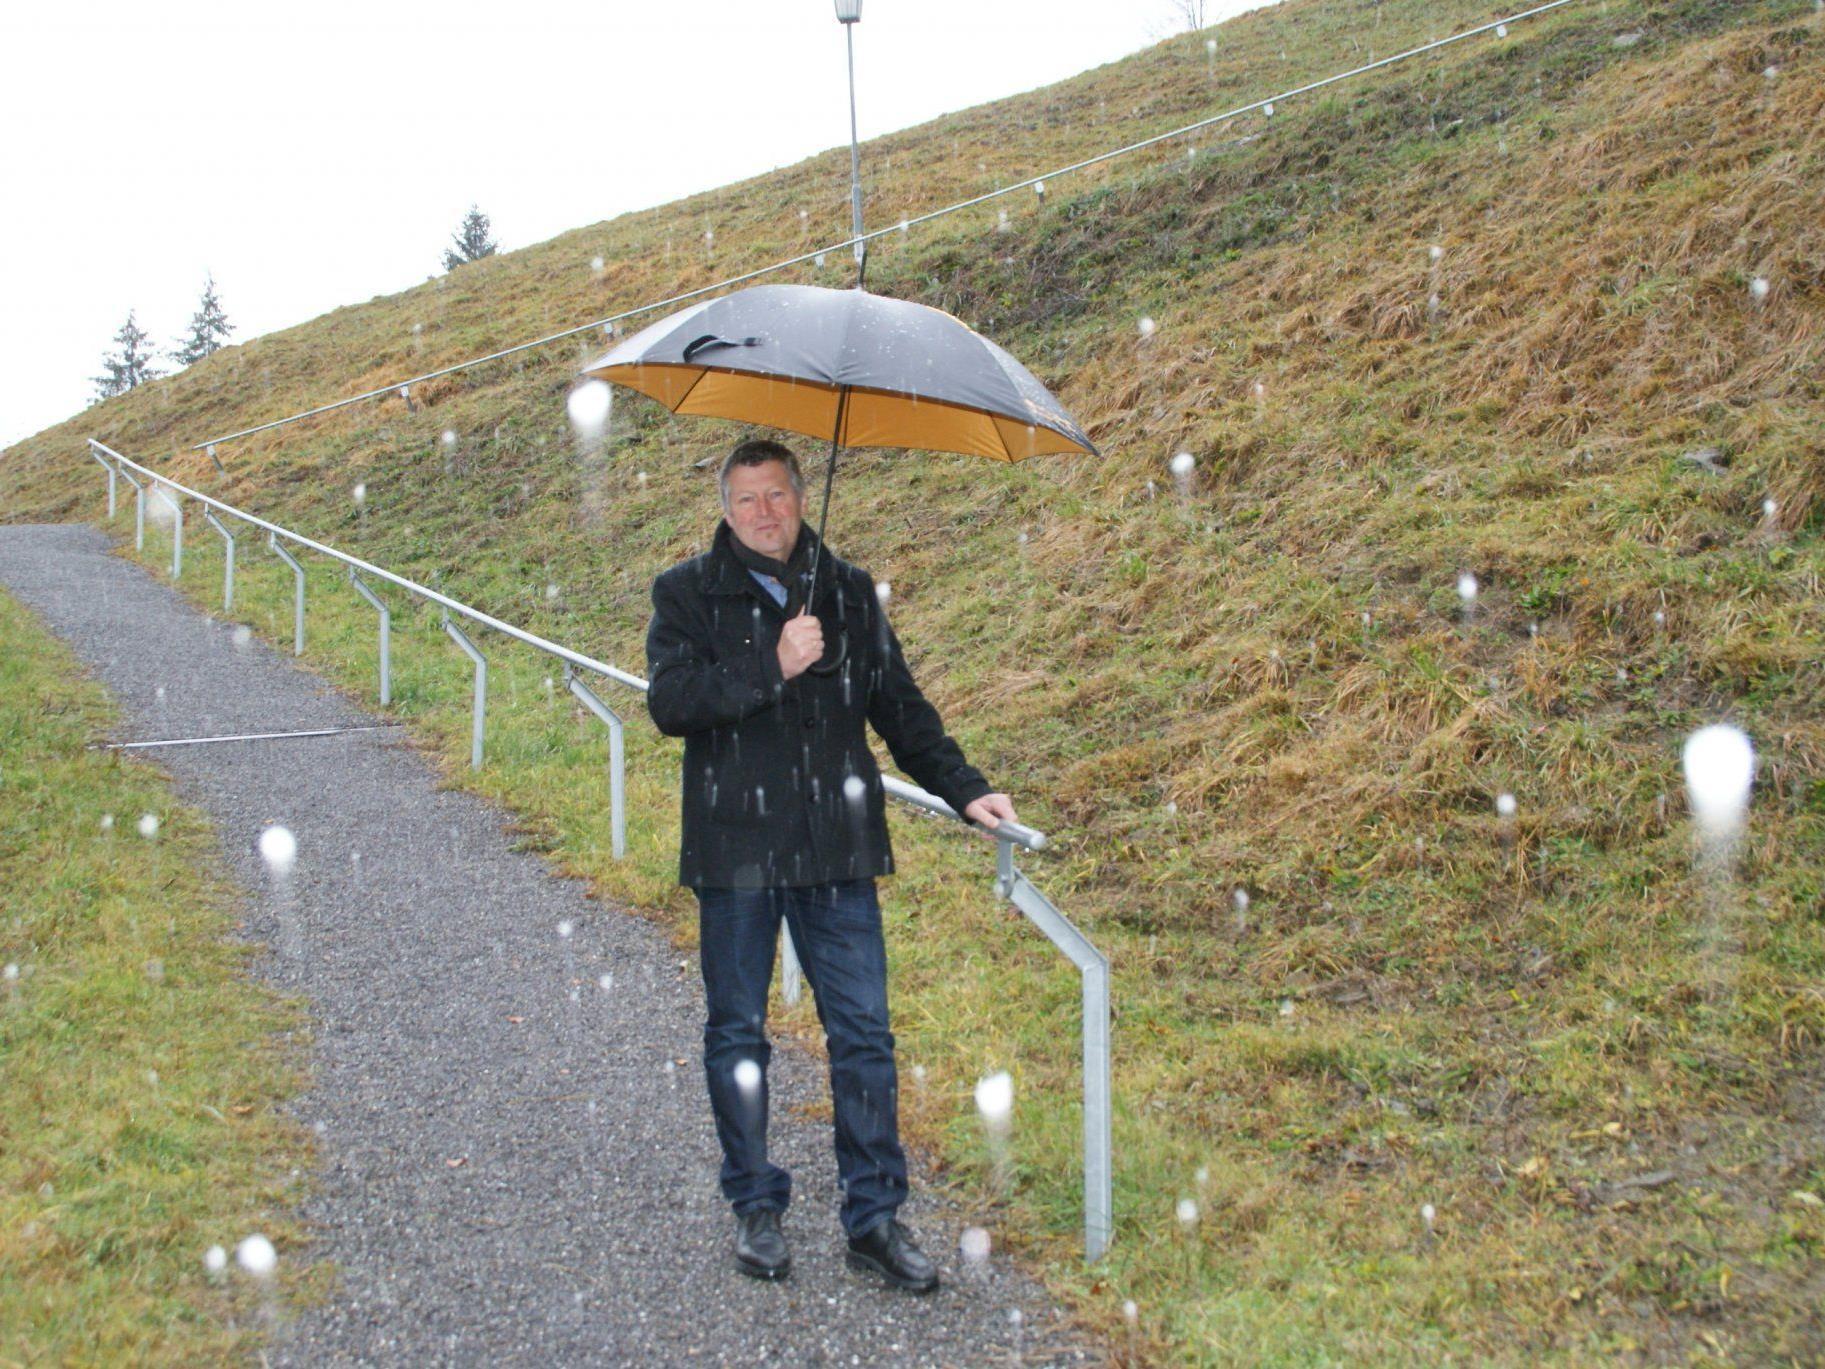 Bürgermeister Josef Bischofberger testet den neuen Gehweg